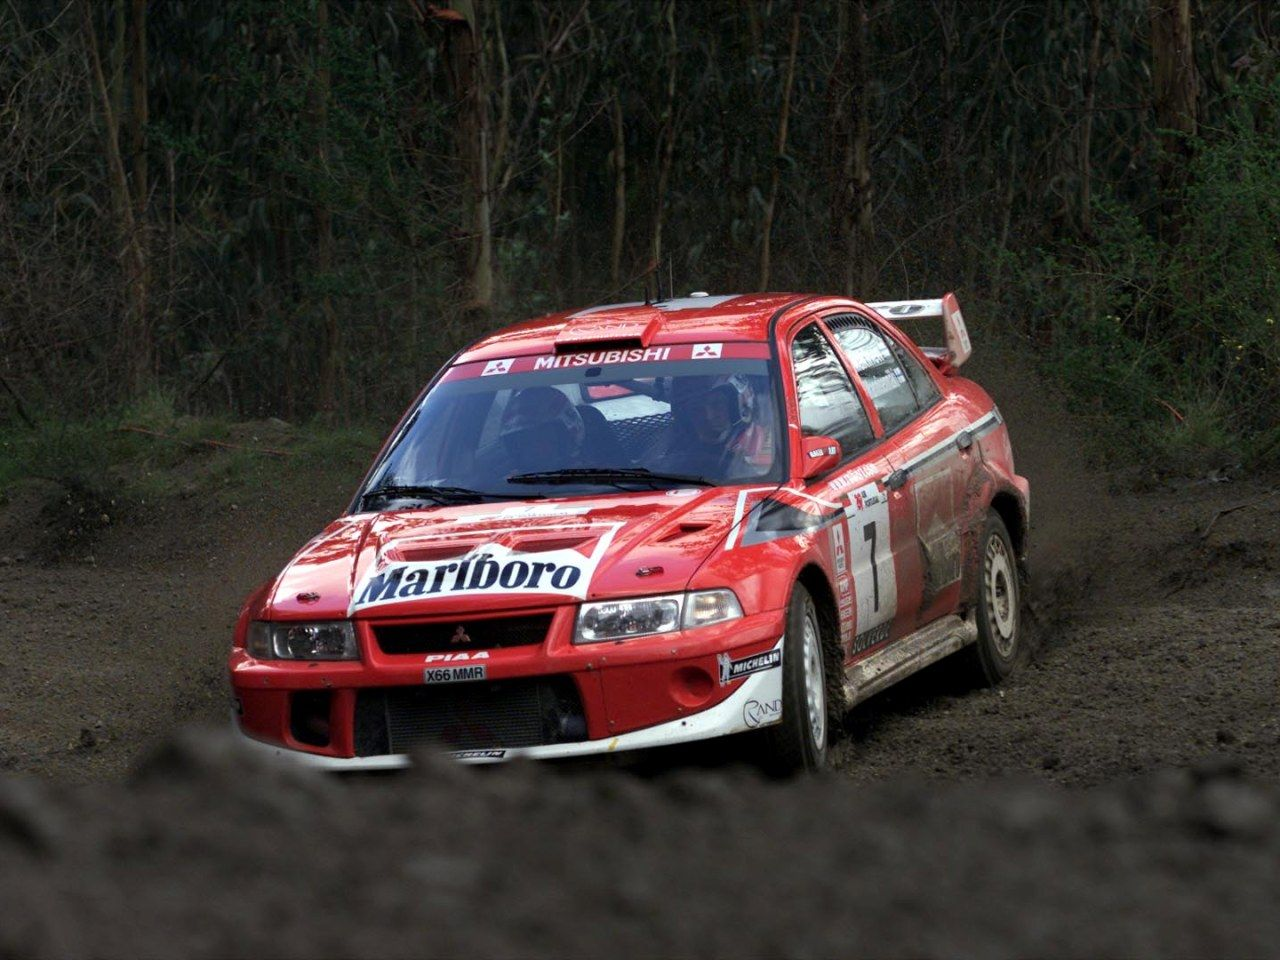 erikwestrallying: Mitsubishi Evo rally car | WRC Cars | Pinterest ...